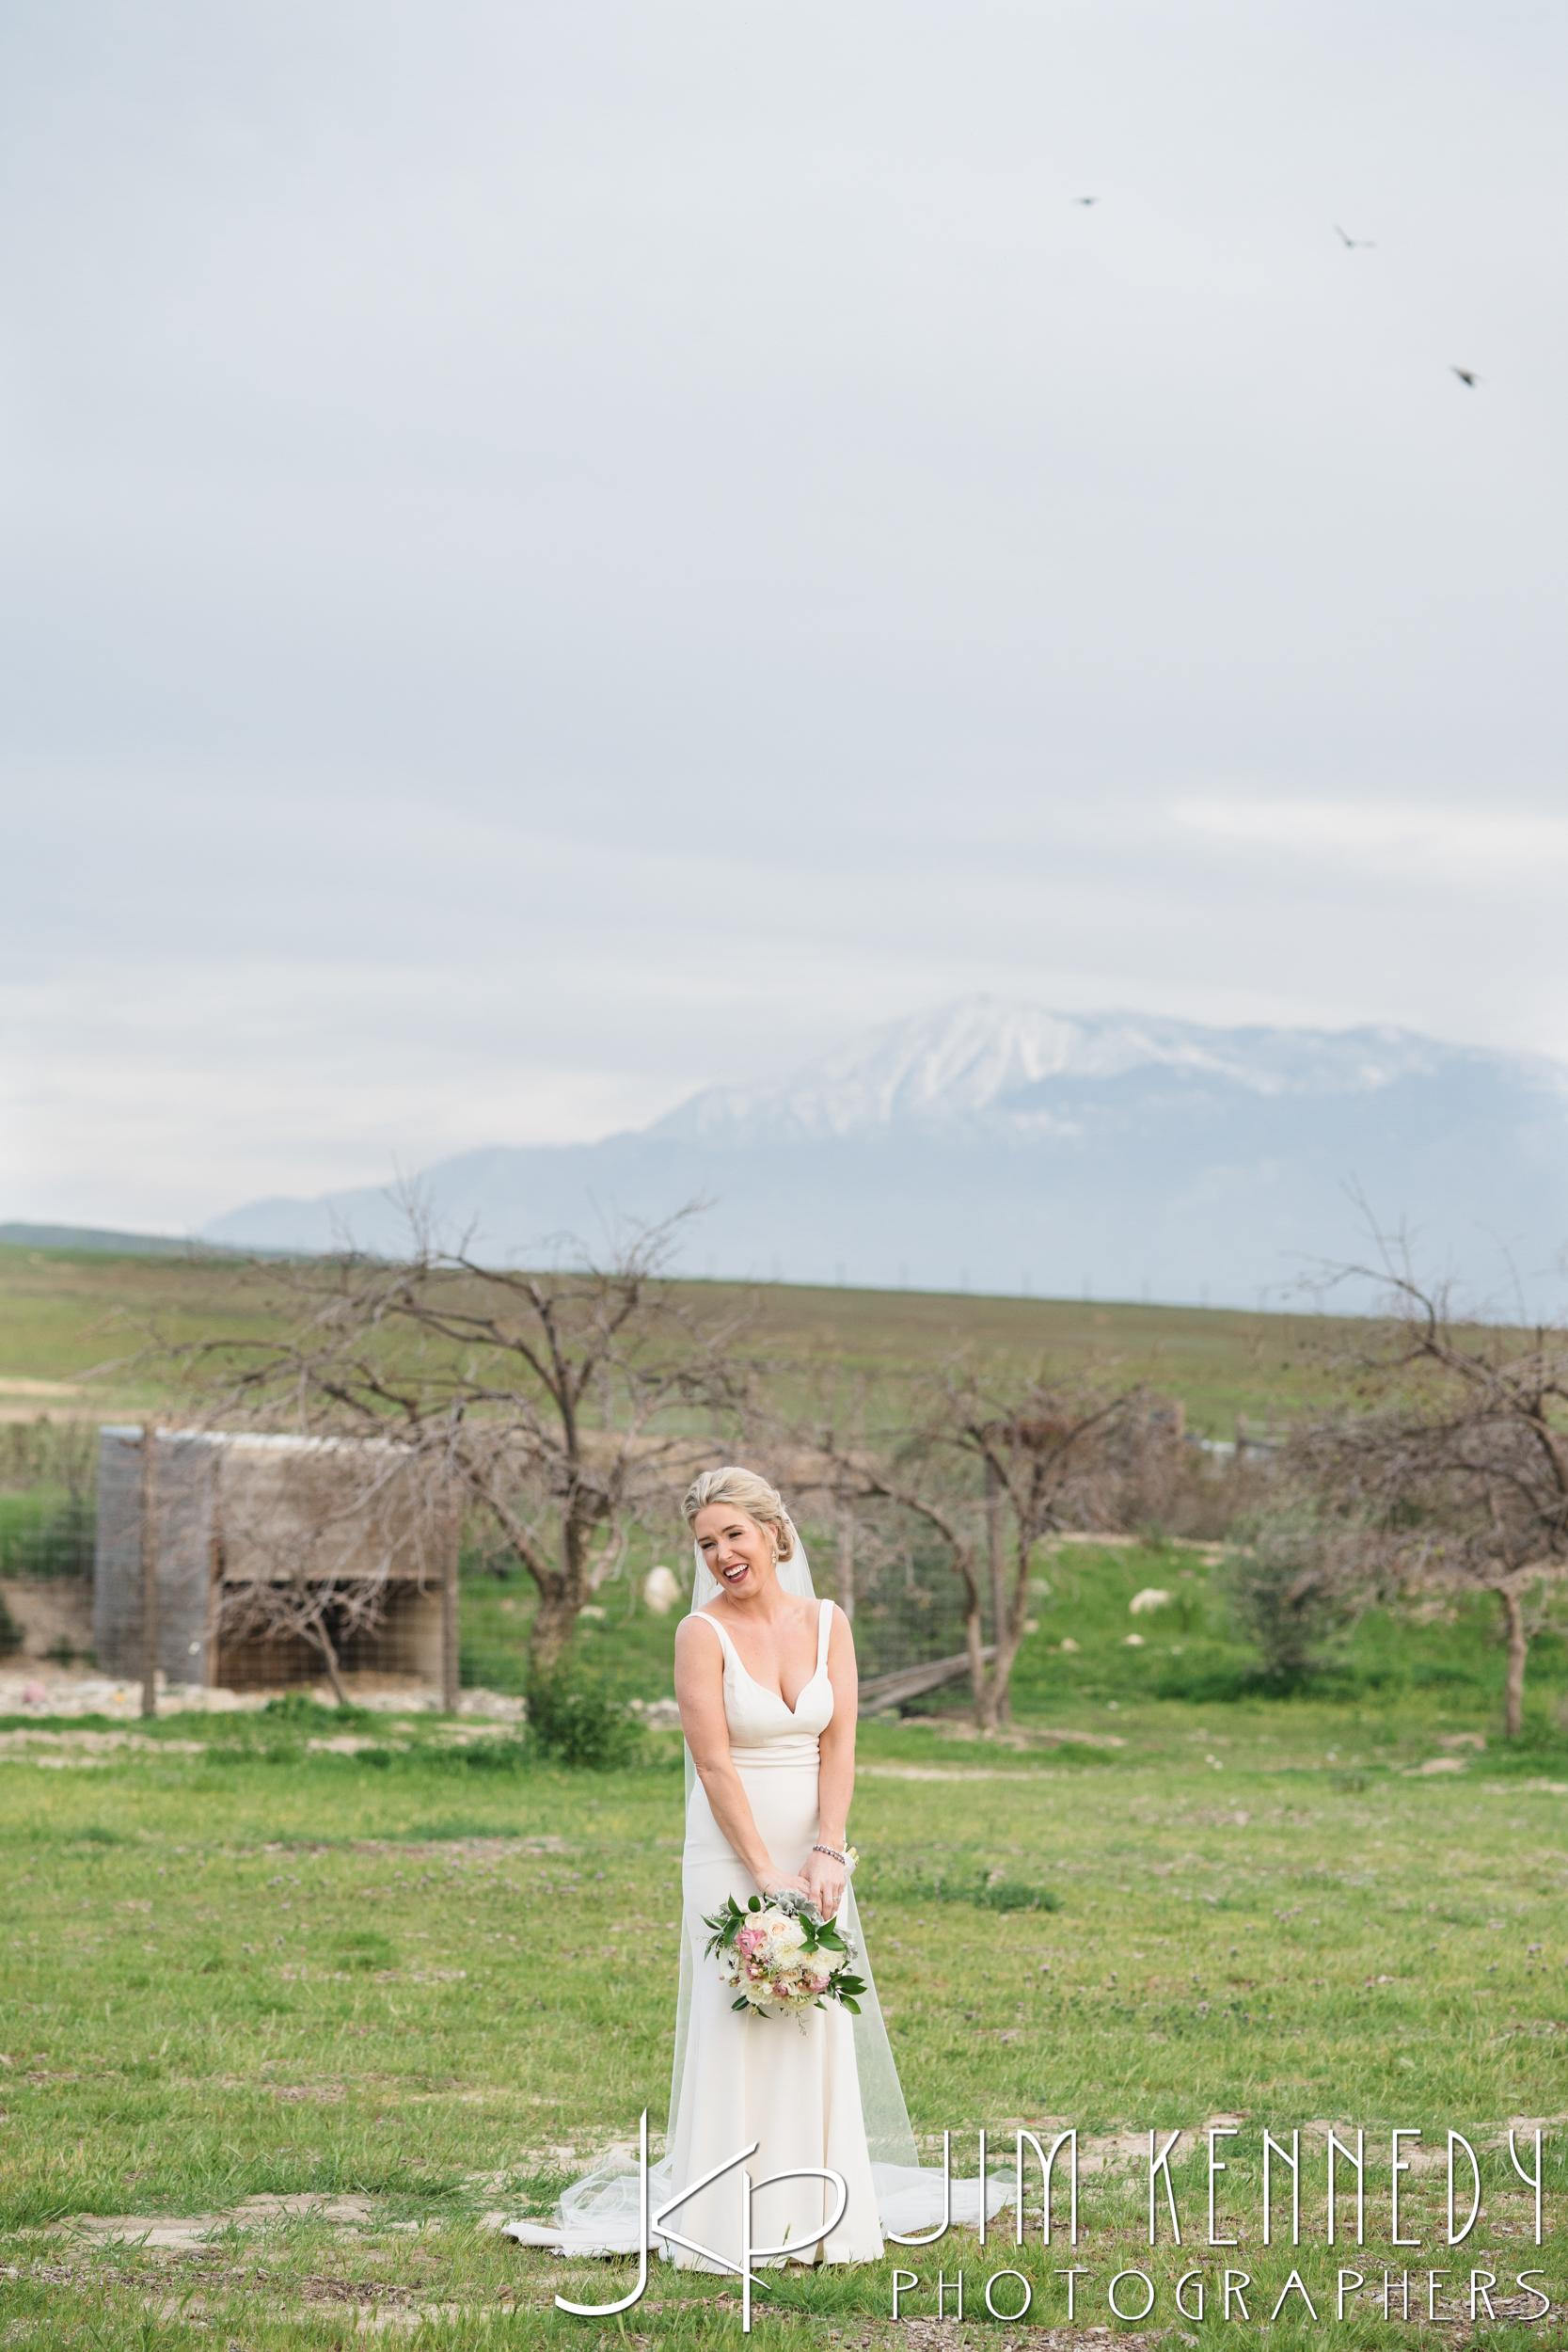 jim_kennedy_photographers_highland_springs_wedding_caitlyn_0138.jpg